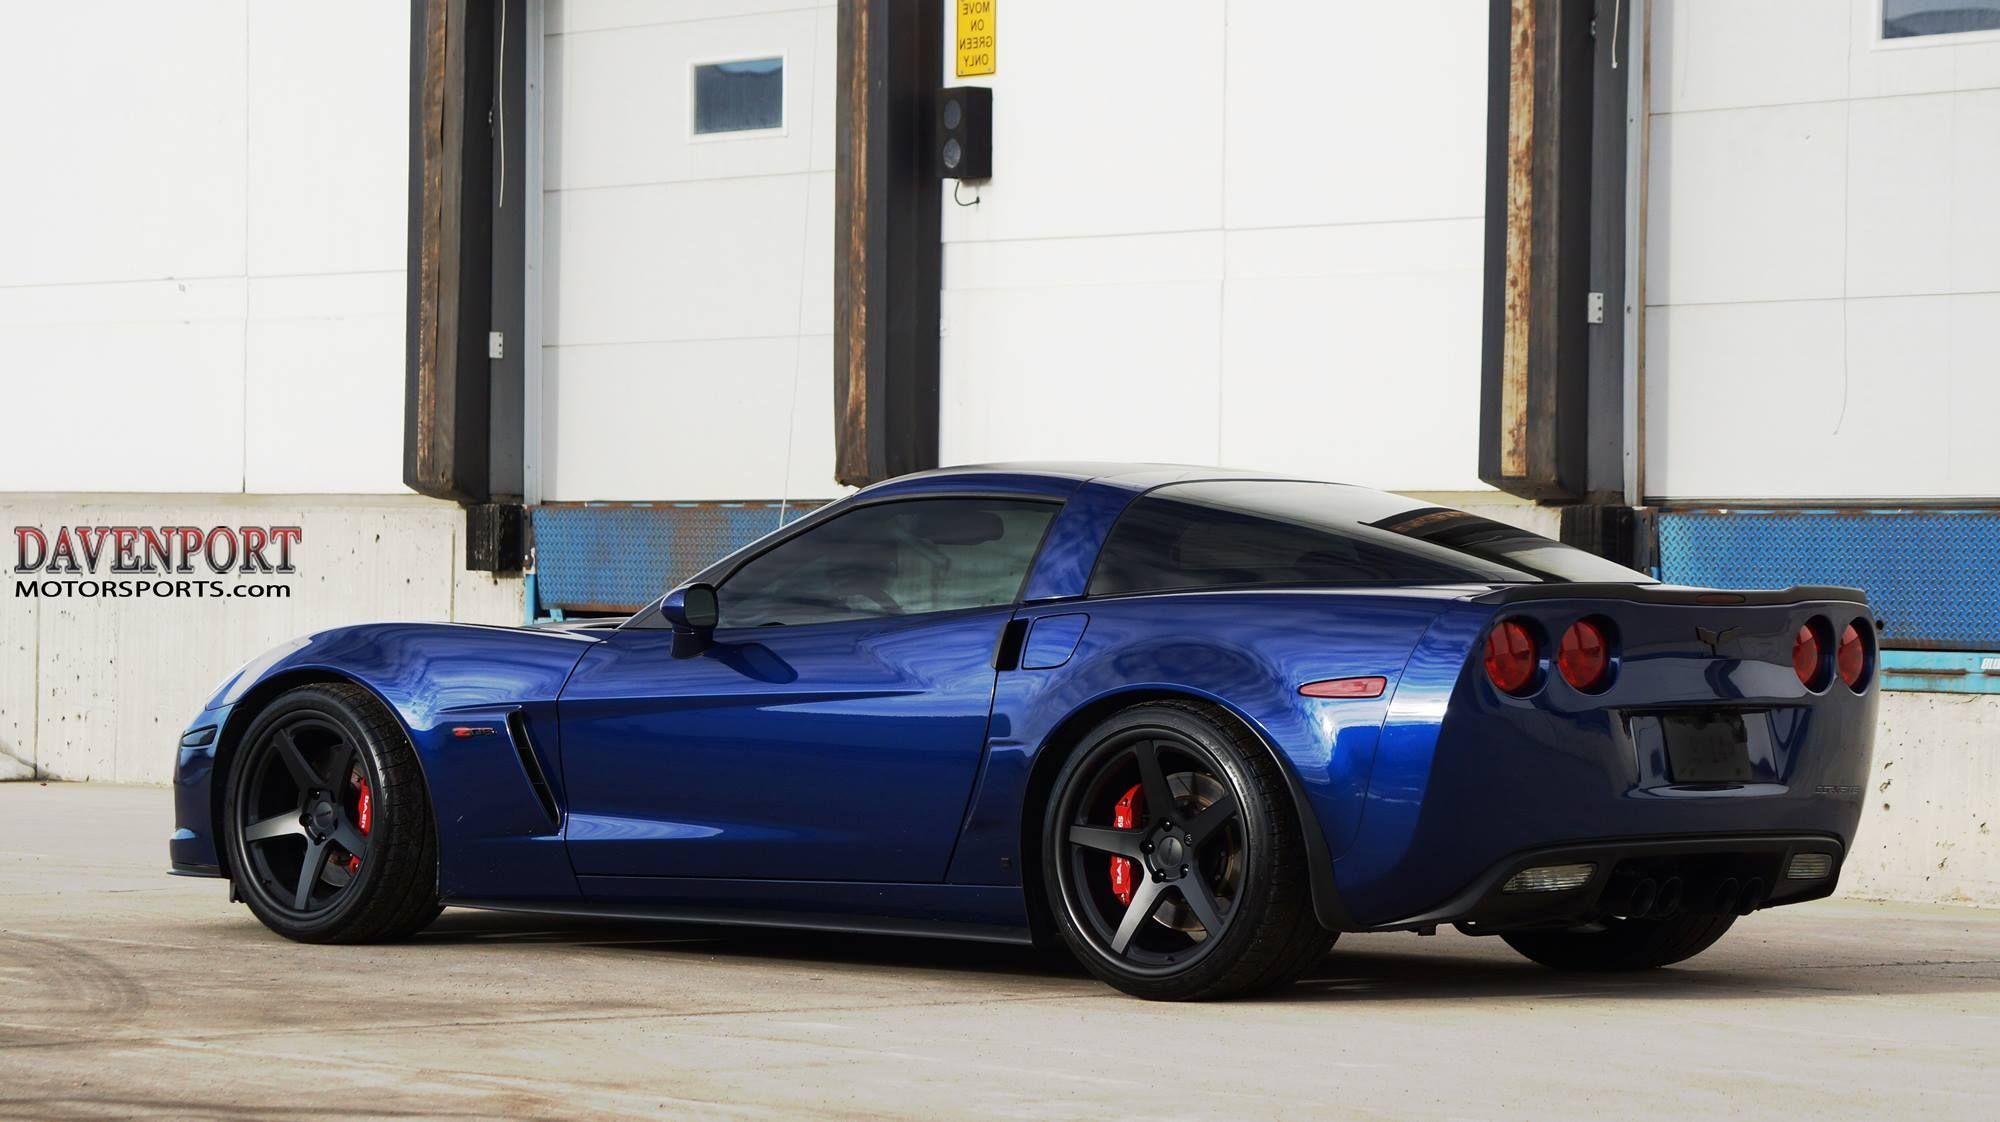 2013 Chevrolet Corvette Z06 | 660+HP All-Motor Davenport Motorsports C6 Corvette Z06 on Forgeline CF3C Concave Wheels